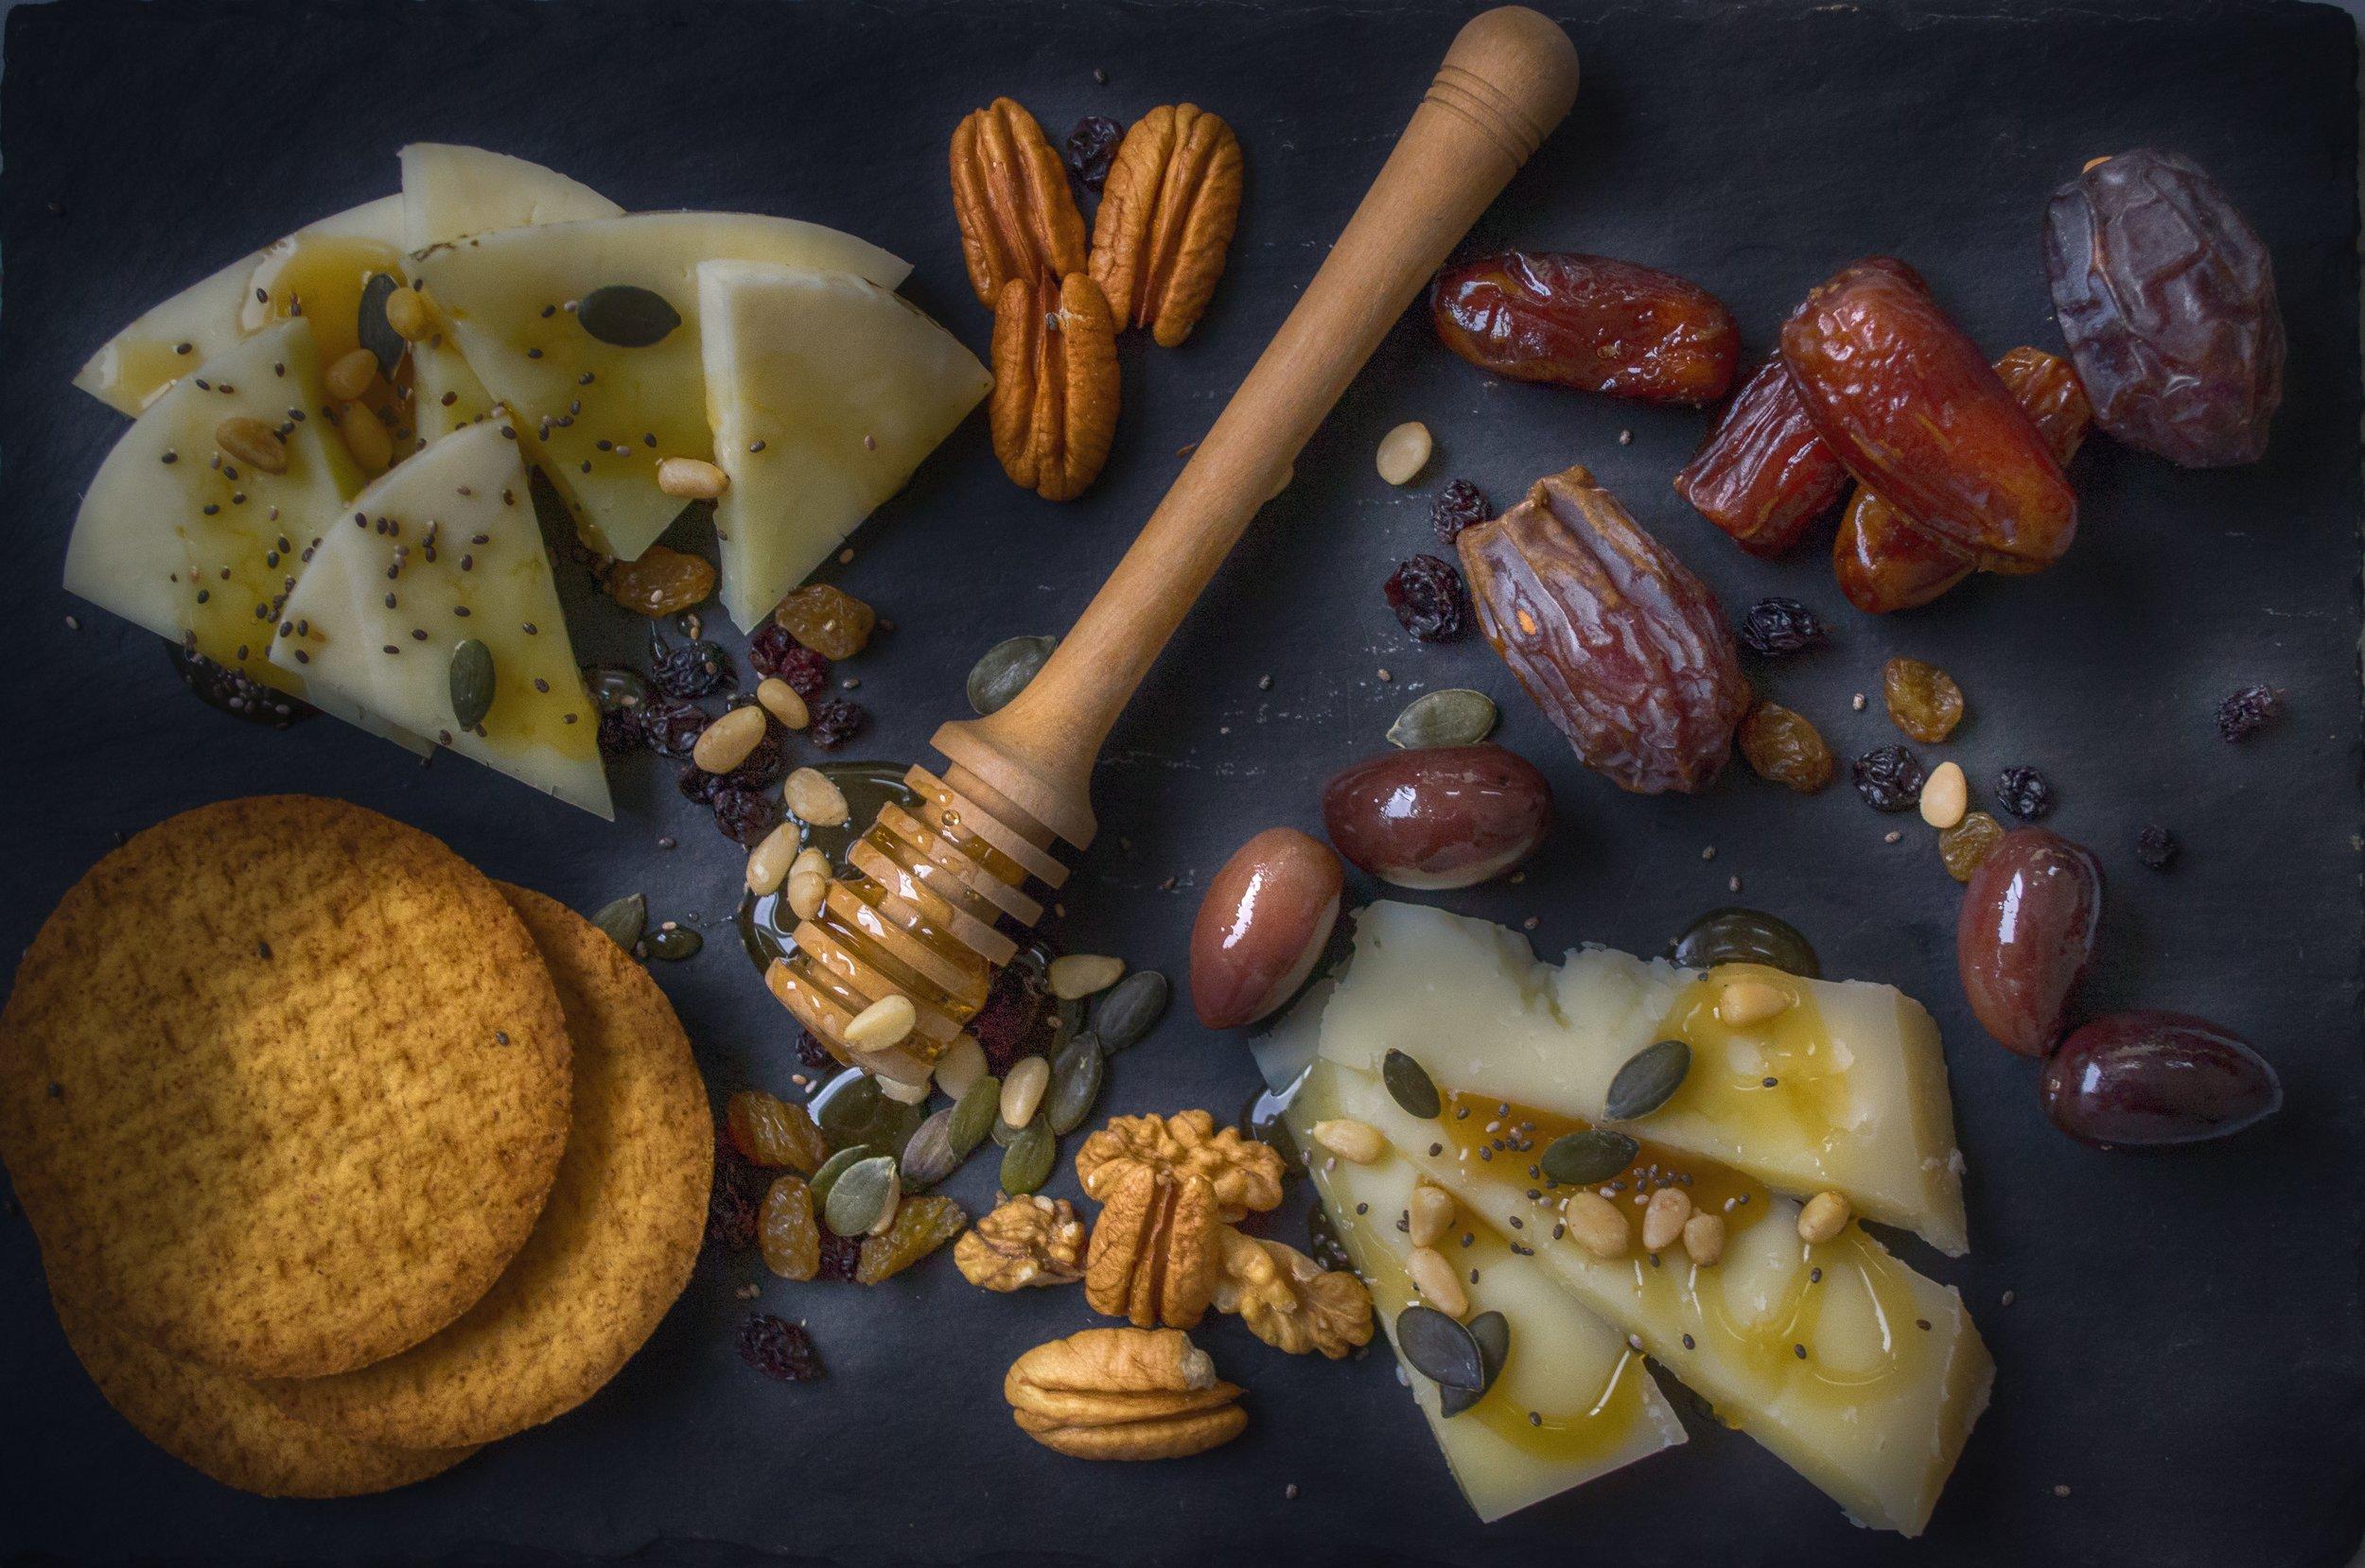 10 best snacks for PCOS // PCOS Snack Ideas // PCOS Weight Loss // 10 PCOS Friendly Snack Ideas // PCOS Friendly Snacks    PCOSLiving.com  #pcos #lowcarbsnacks